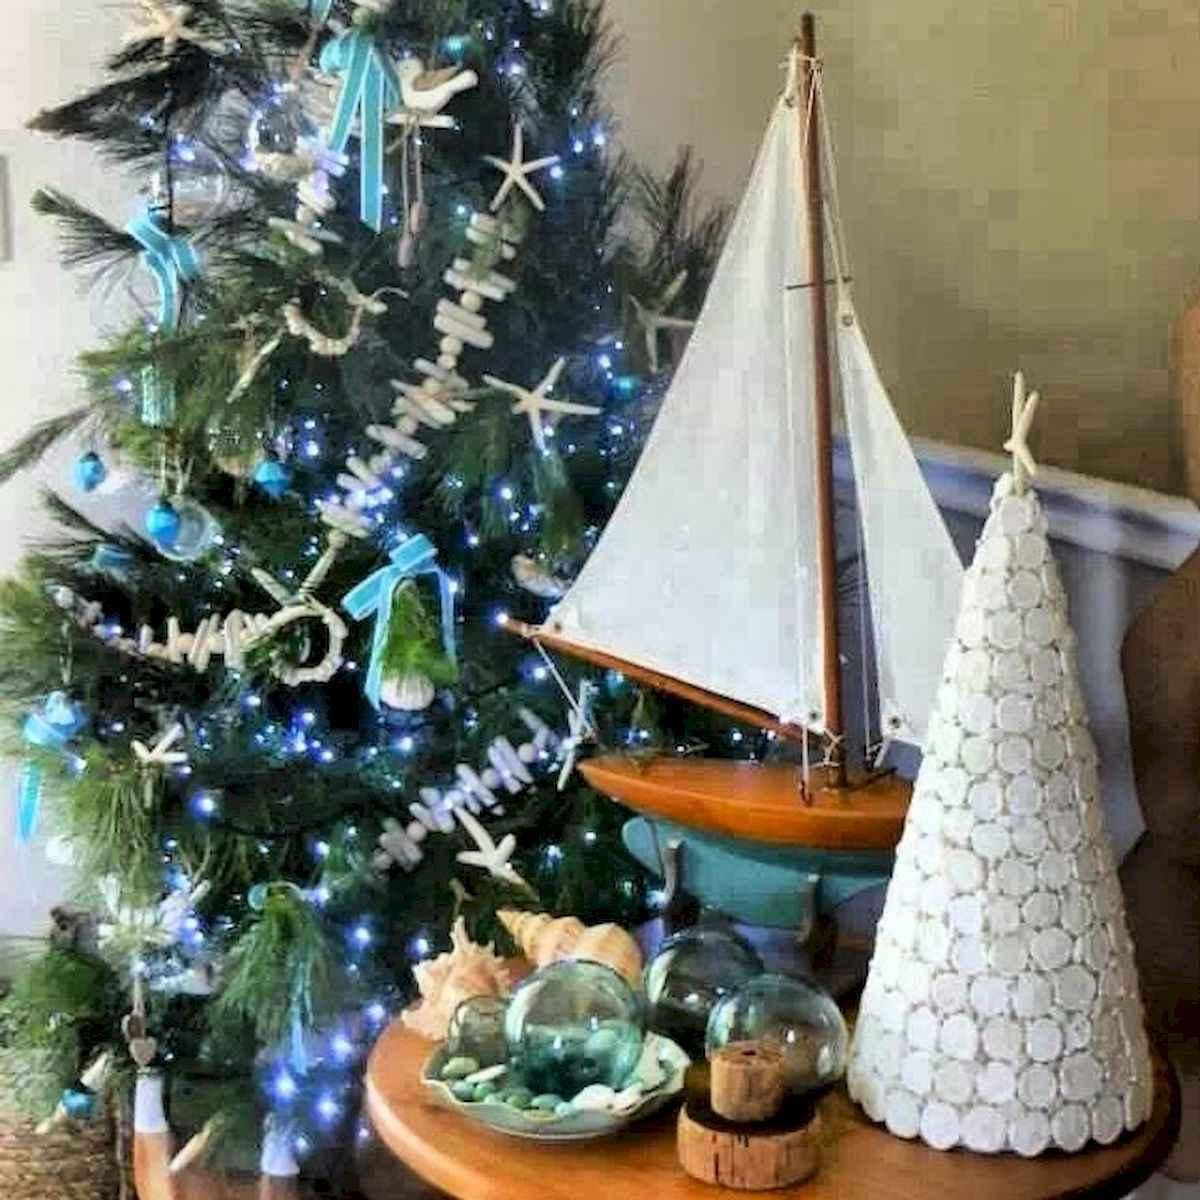 1200 1200 in 40 coastal christmas decor - Coastal Christmas Tree